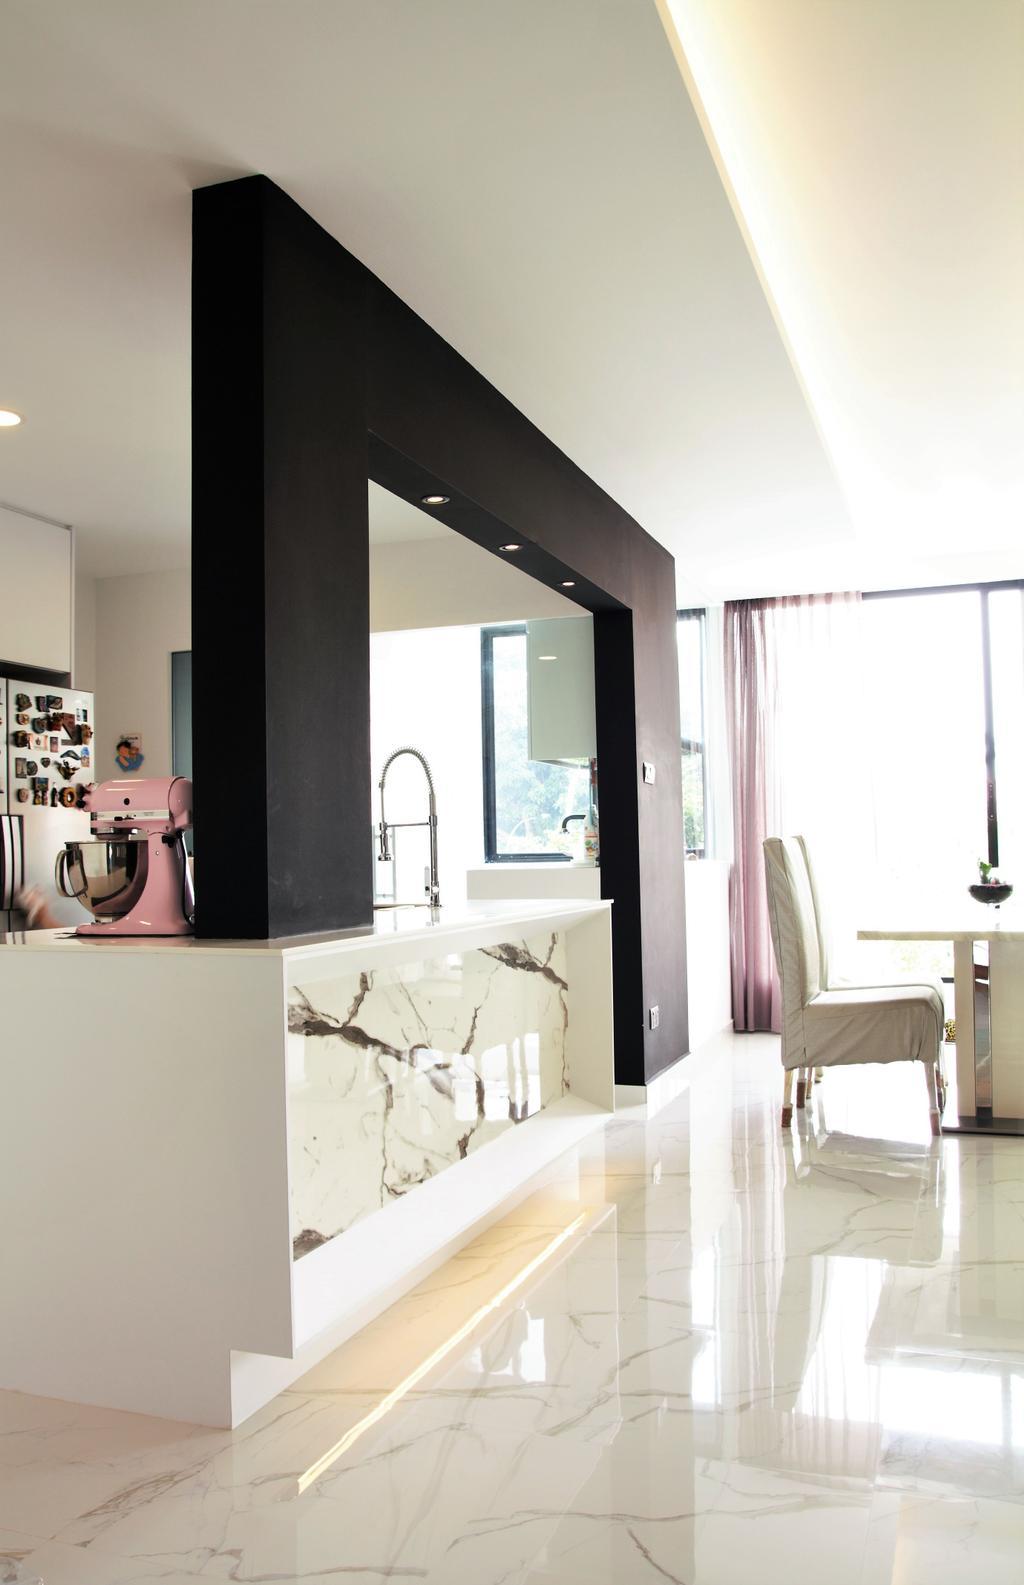 Landed, Bedok, Interior Designer, Intrigue-d Design Consultancy, Bathroom, Indoors, Interior Design, Room, Mixer